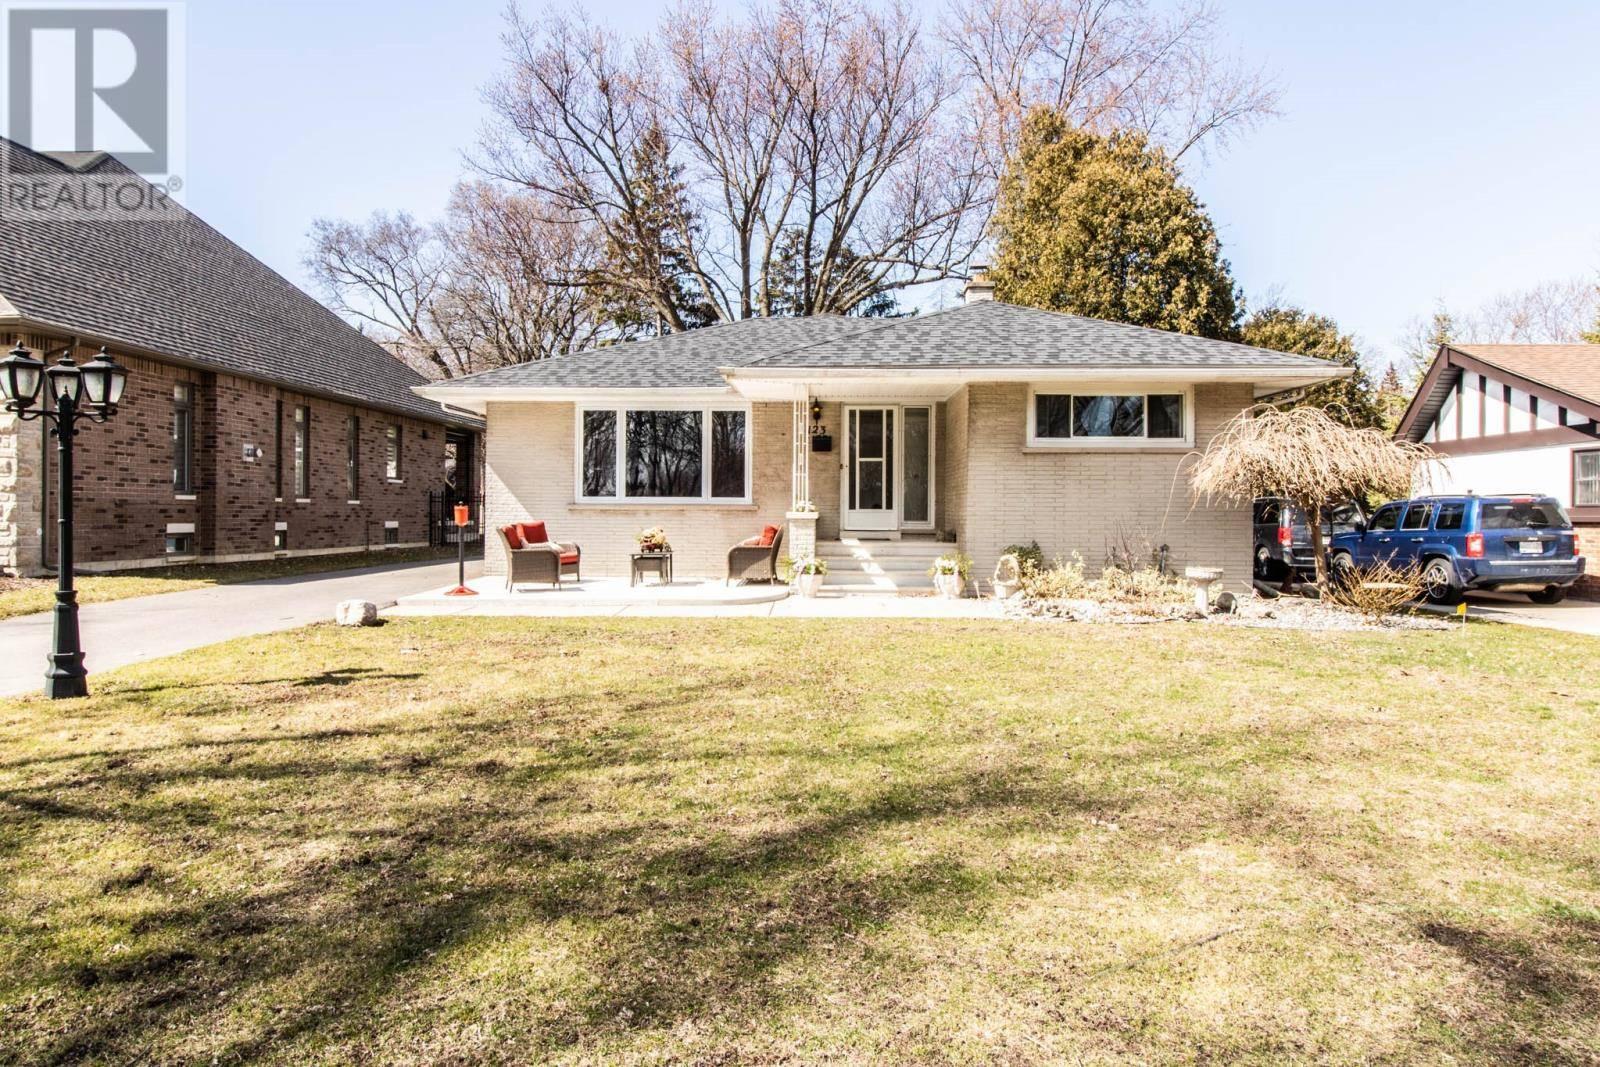 House for sale at 123 Kensington  Tecumseh Ontario - MLS: 20003640